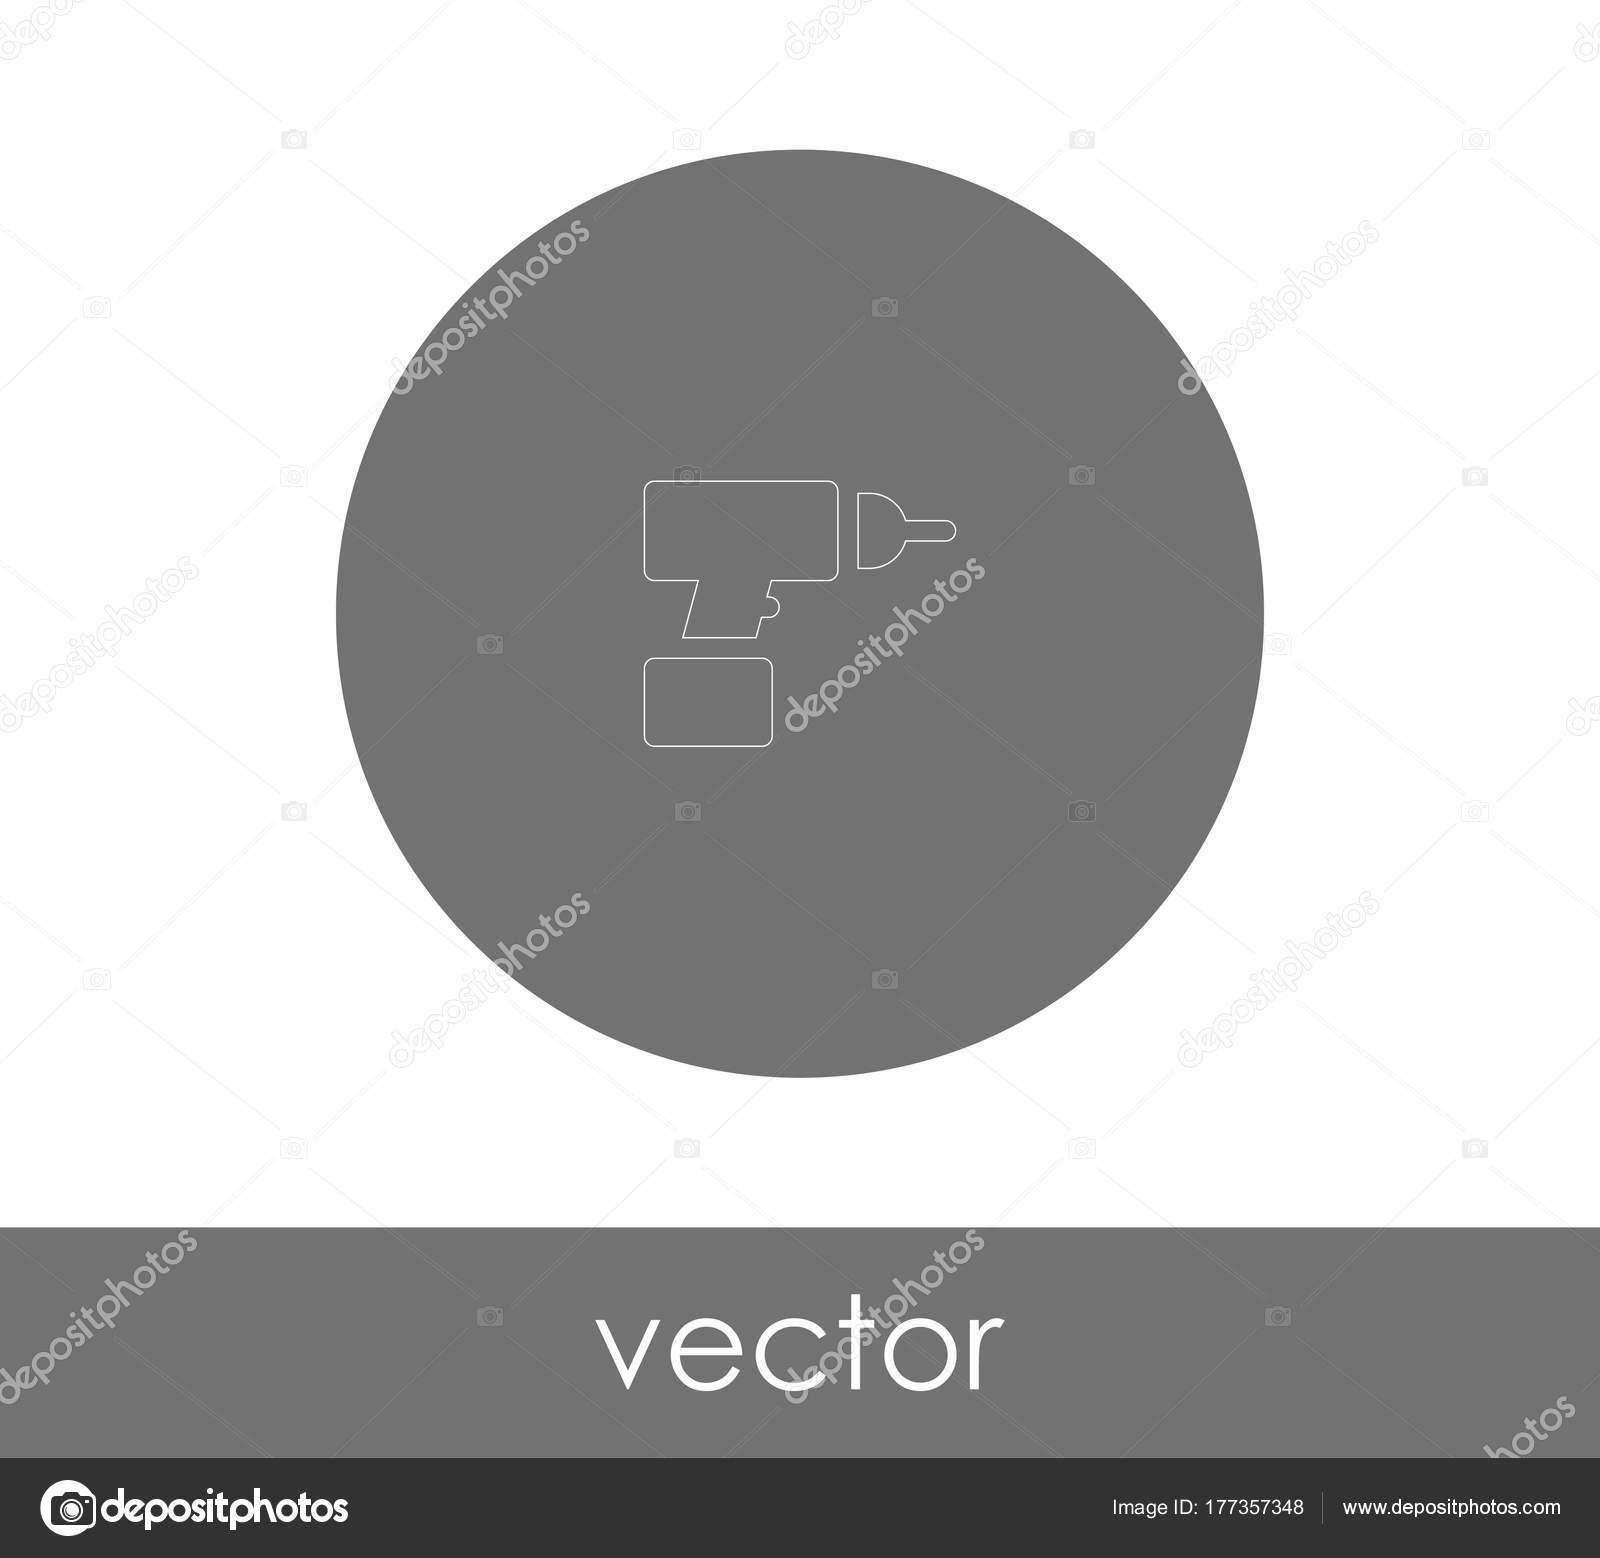 Fantastisch Elektrisches Relais Symbol Fotos - Verdrahtungsideen ...